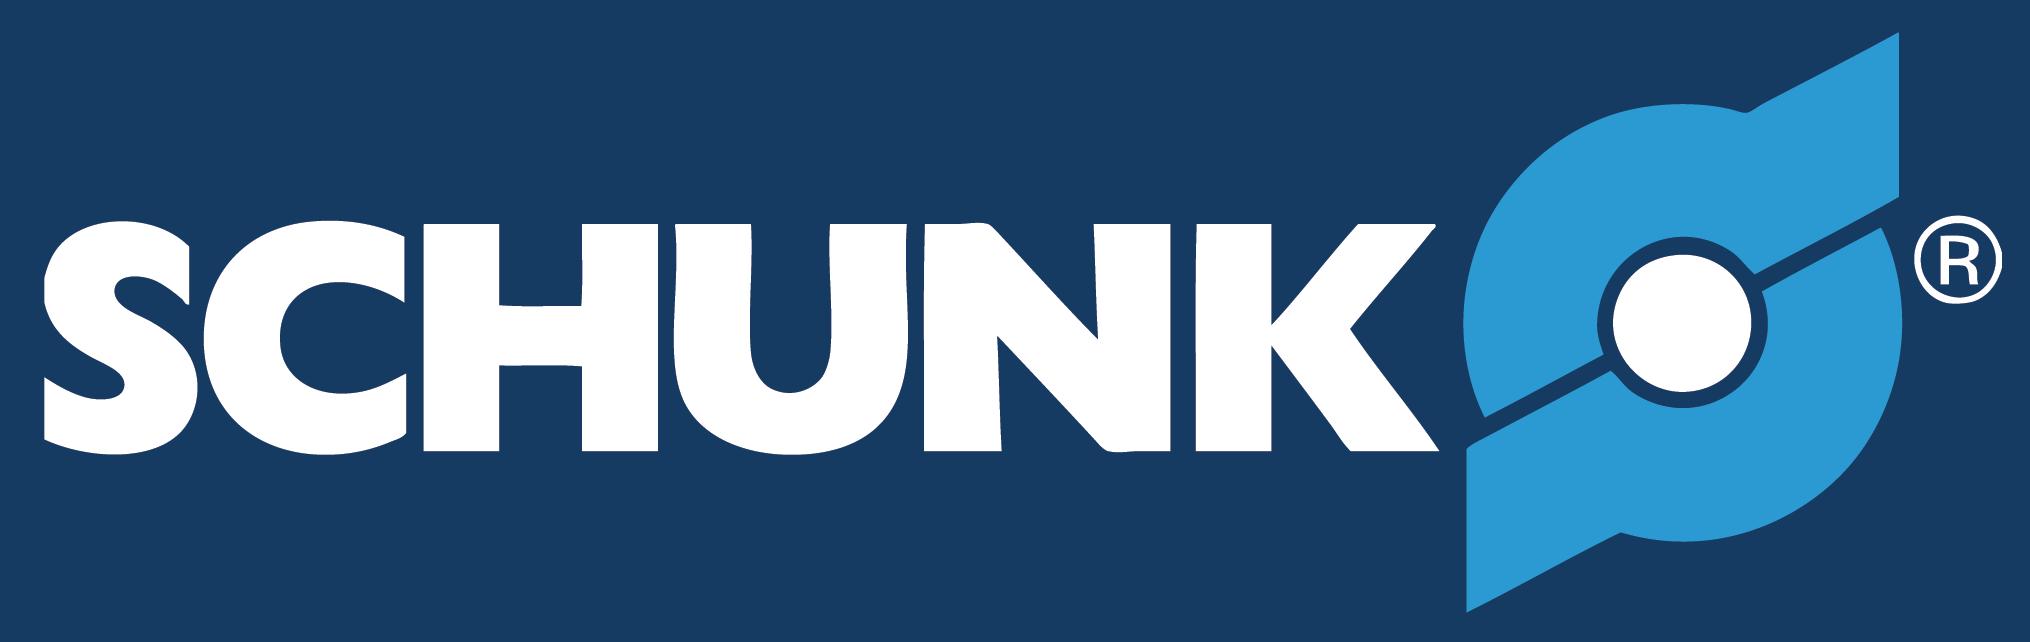 Schunk Logo